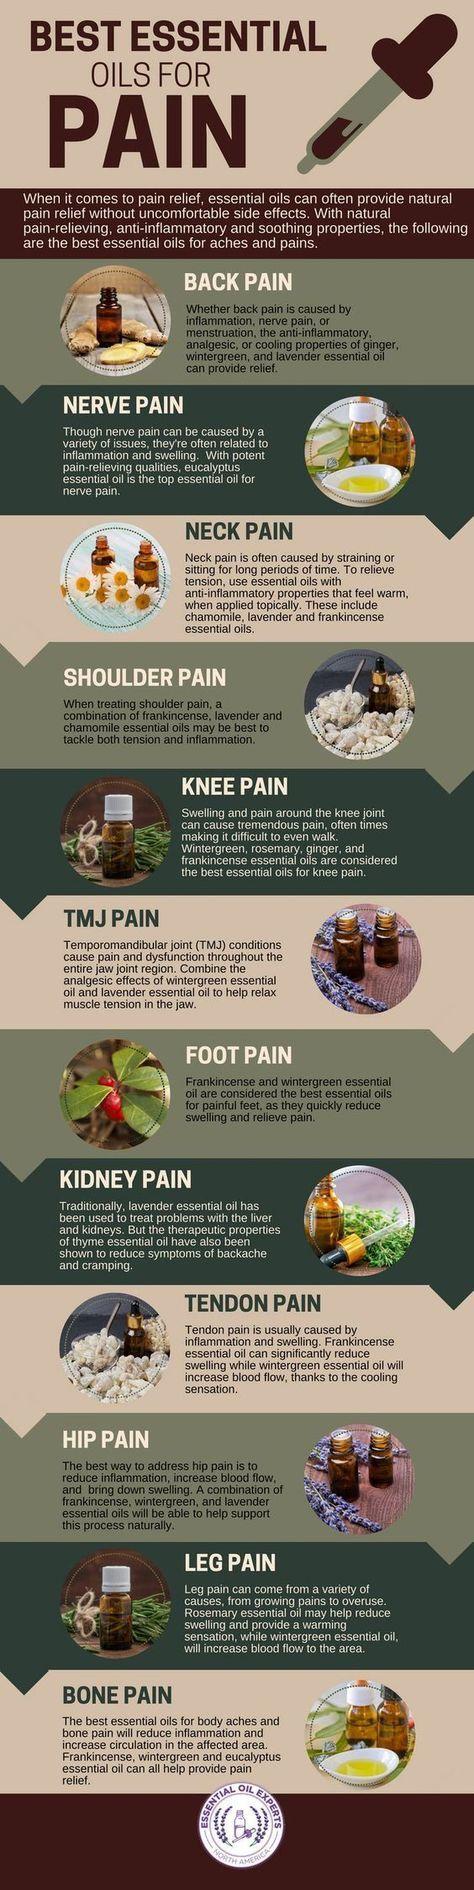 Best Essential Oils for Pain Management - Back, Nerve, Neck, Shoulder & Knee http://www.wartalooza.com/treatments/nail-polish